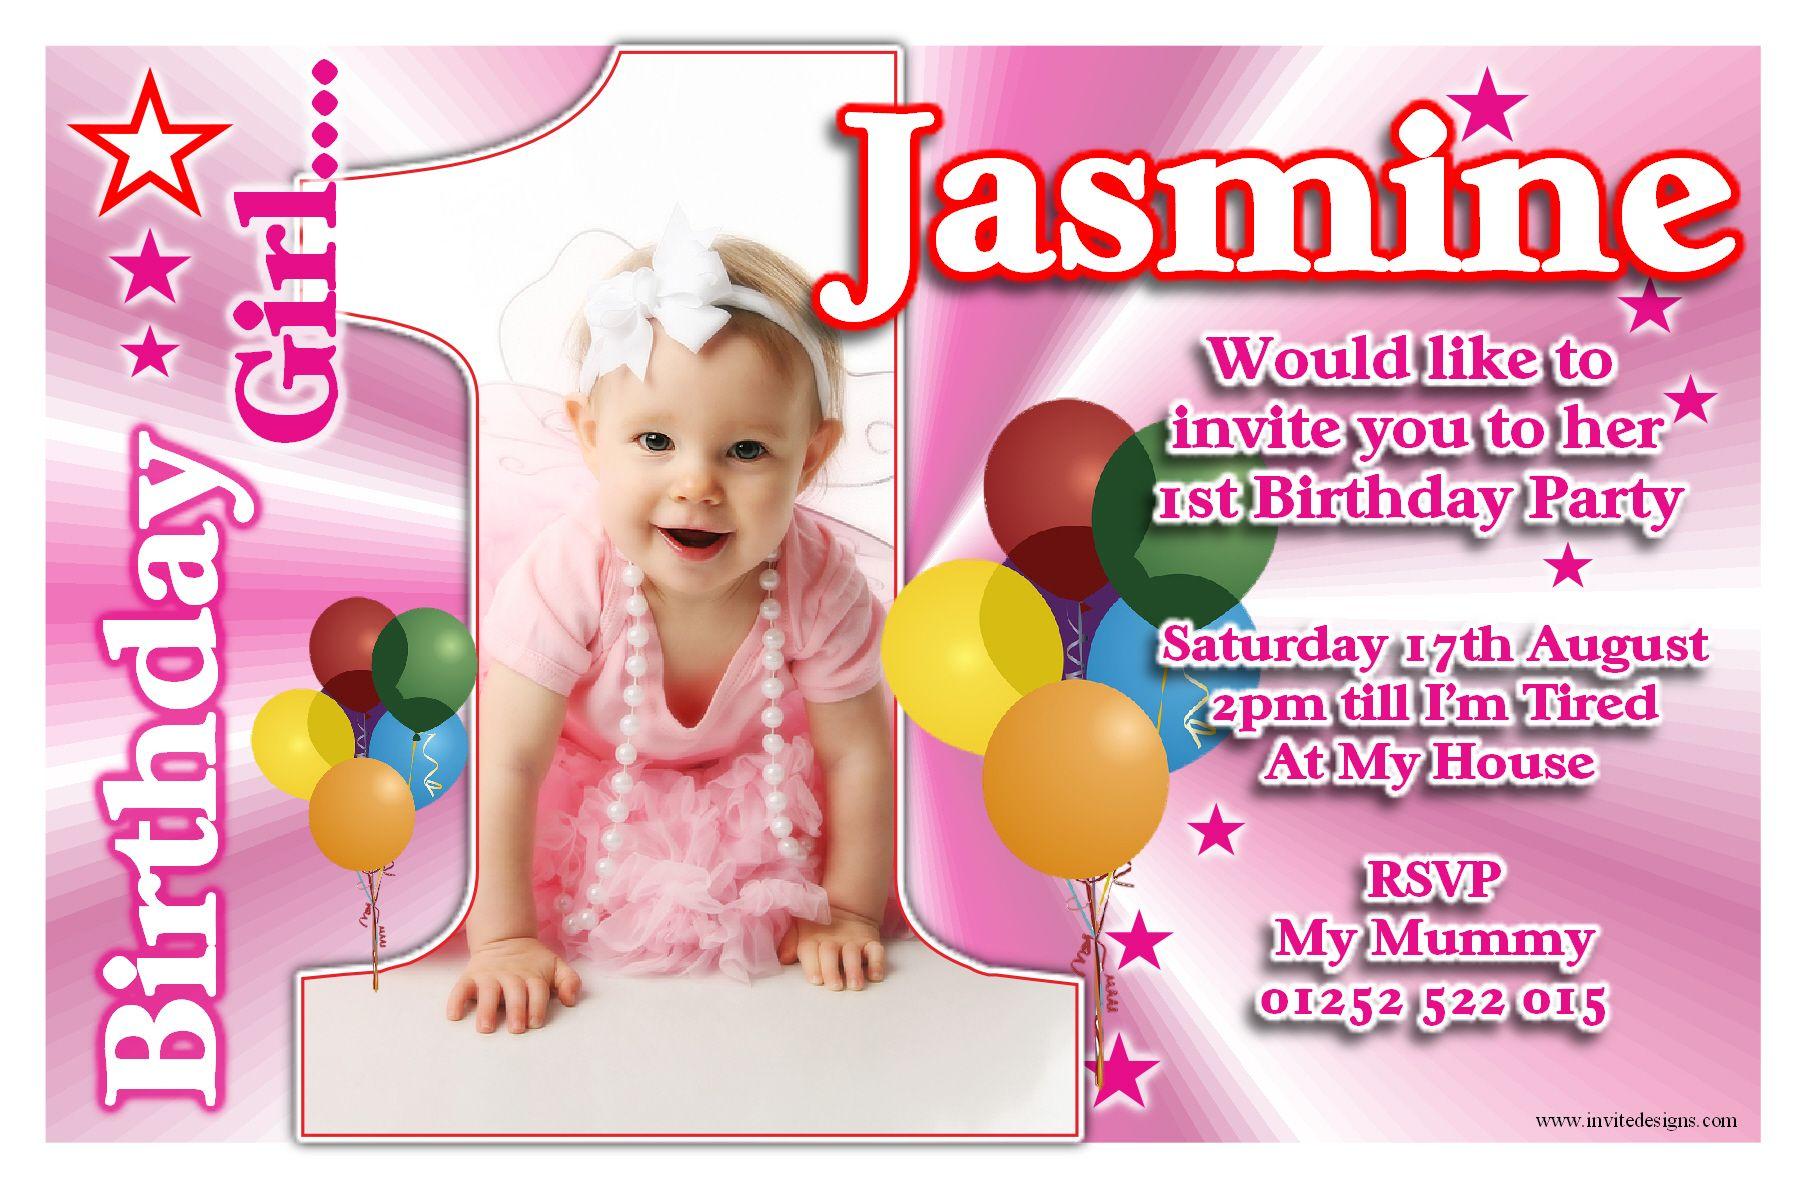 Baby First Birthday Invitation Buscar Con Google Invitations - Birthday invitation card baby